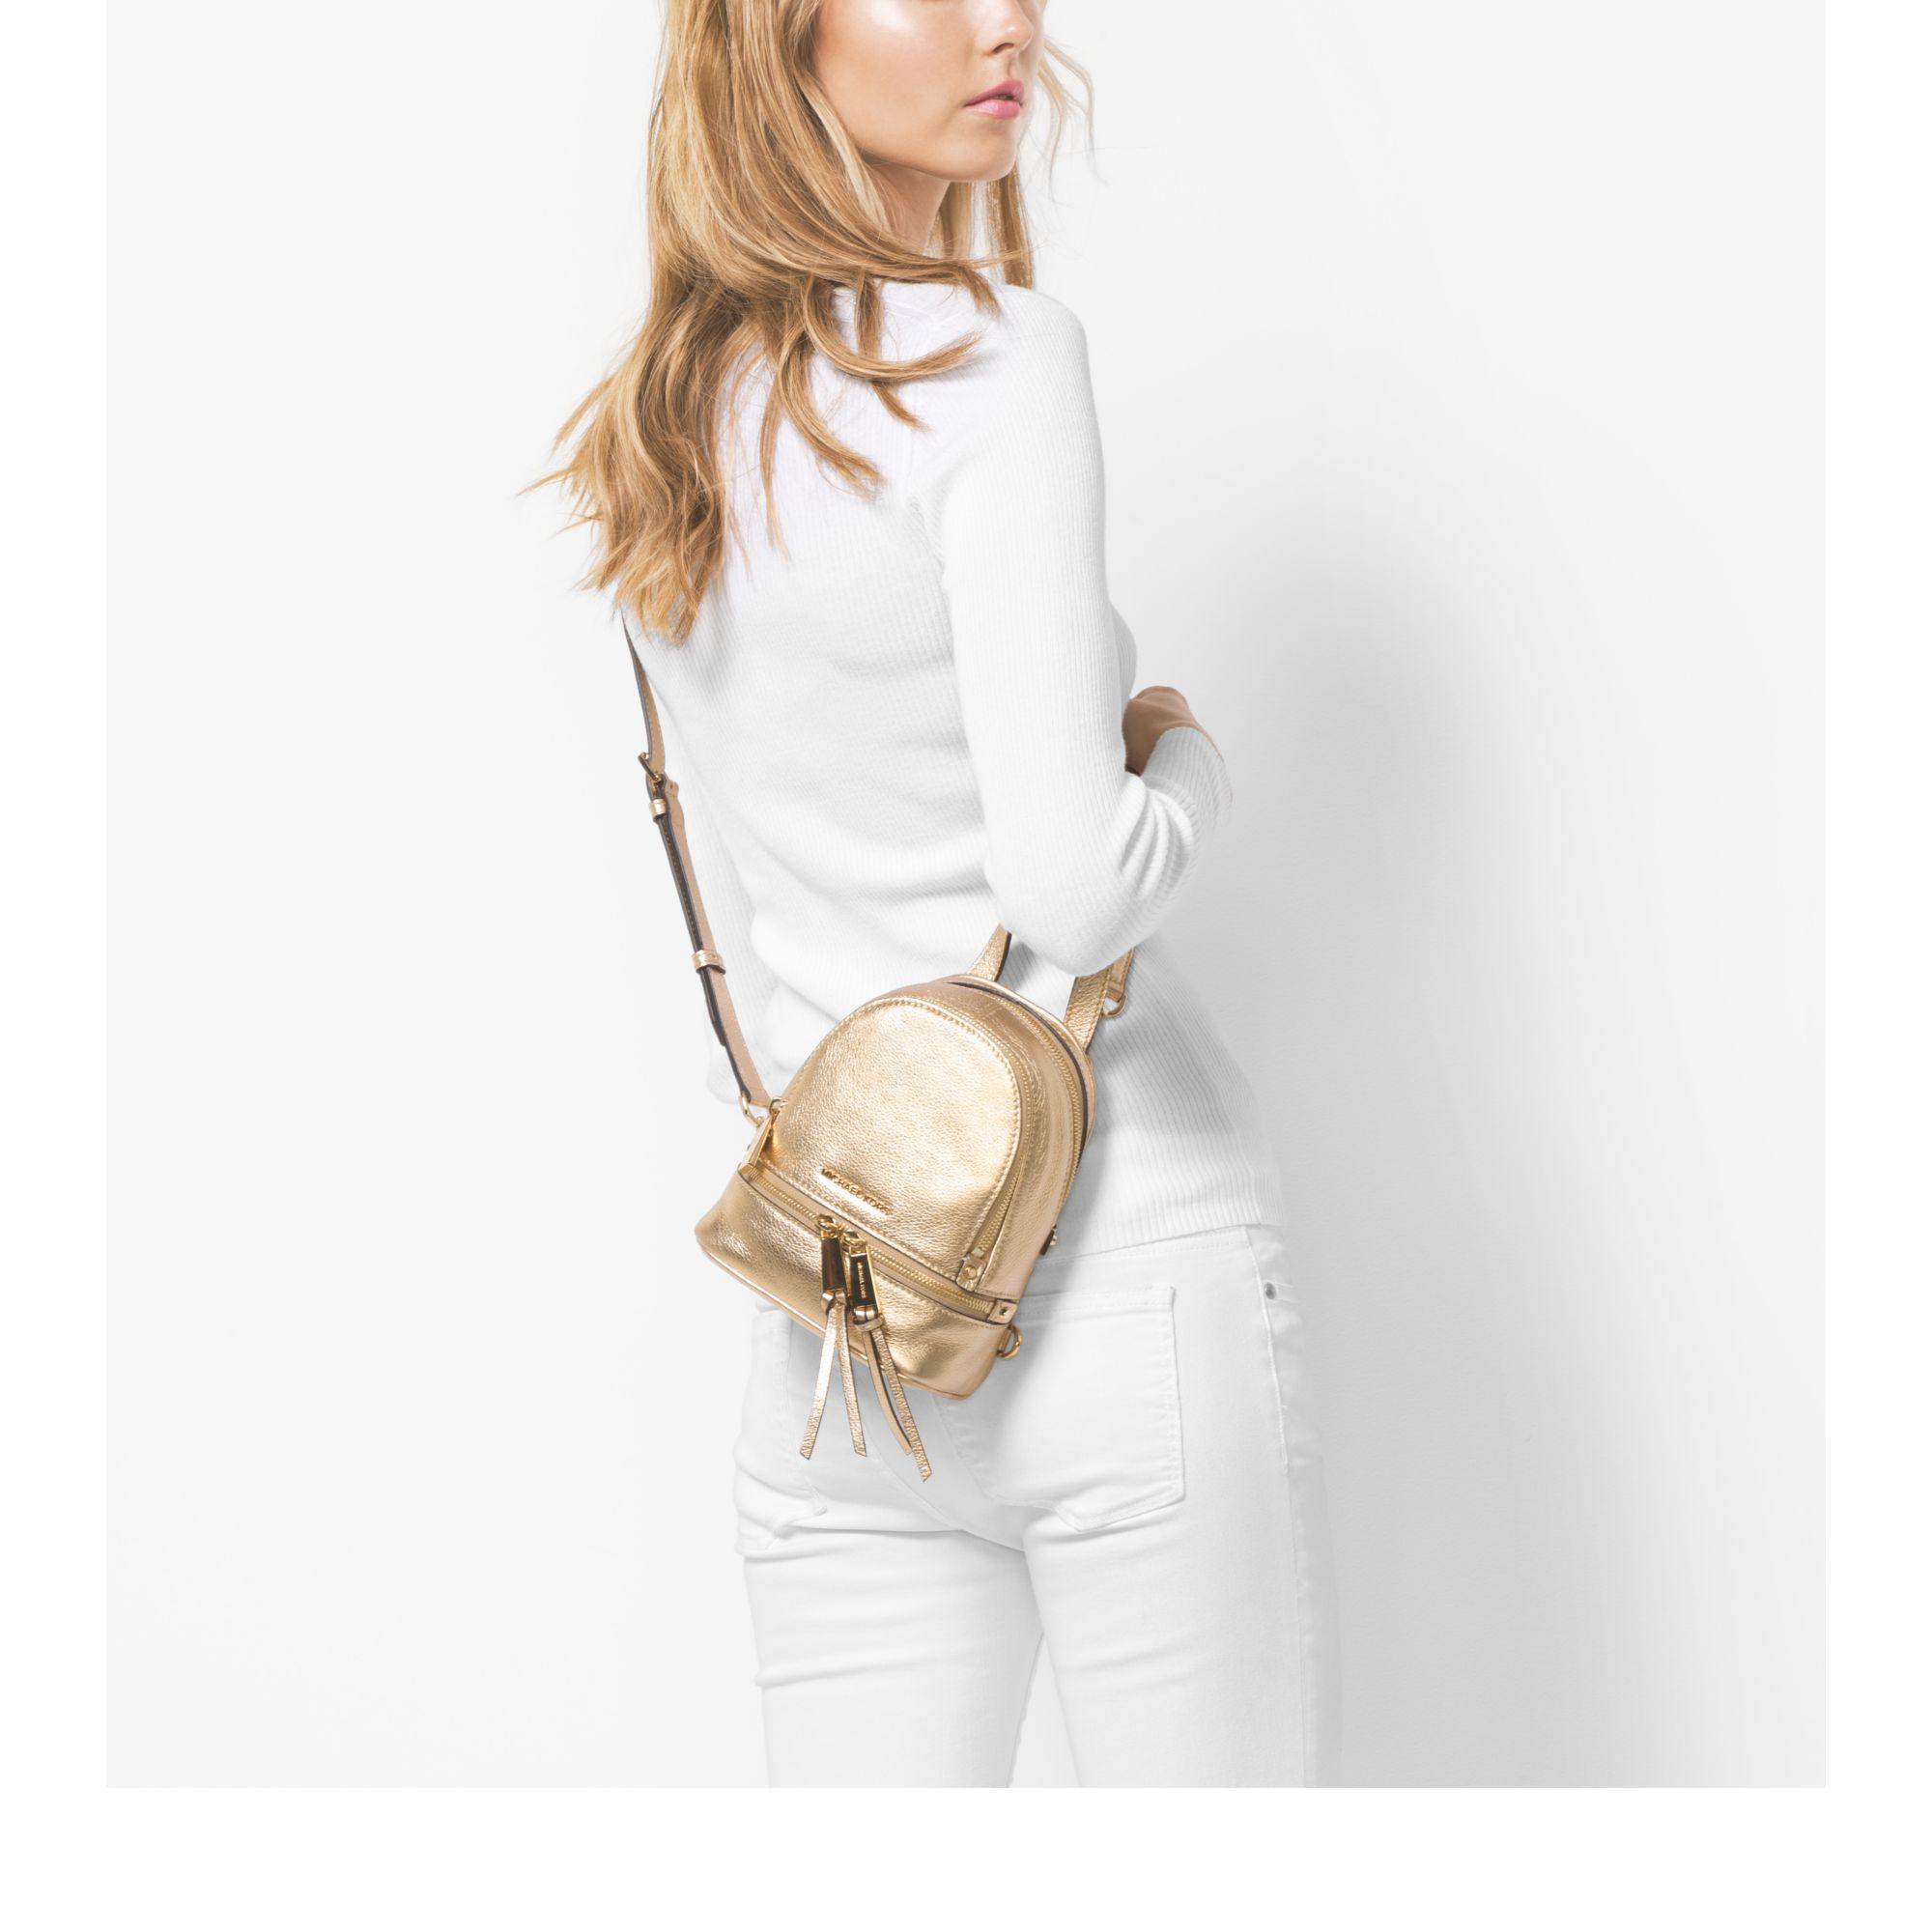 dd4c16e97058 ... promo code for michael kors rhea extra small metallic leather backpack  in metallic lyst 9ea90 4615b